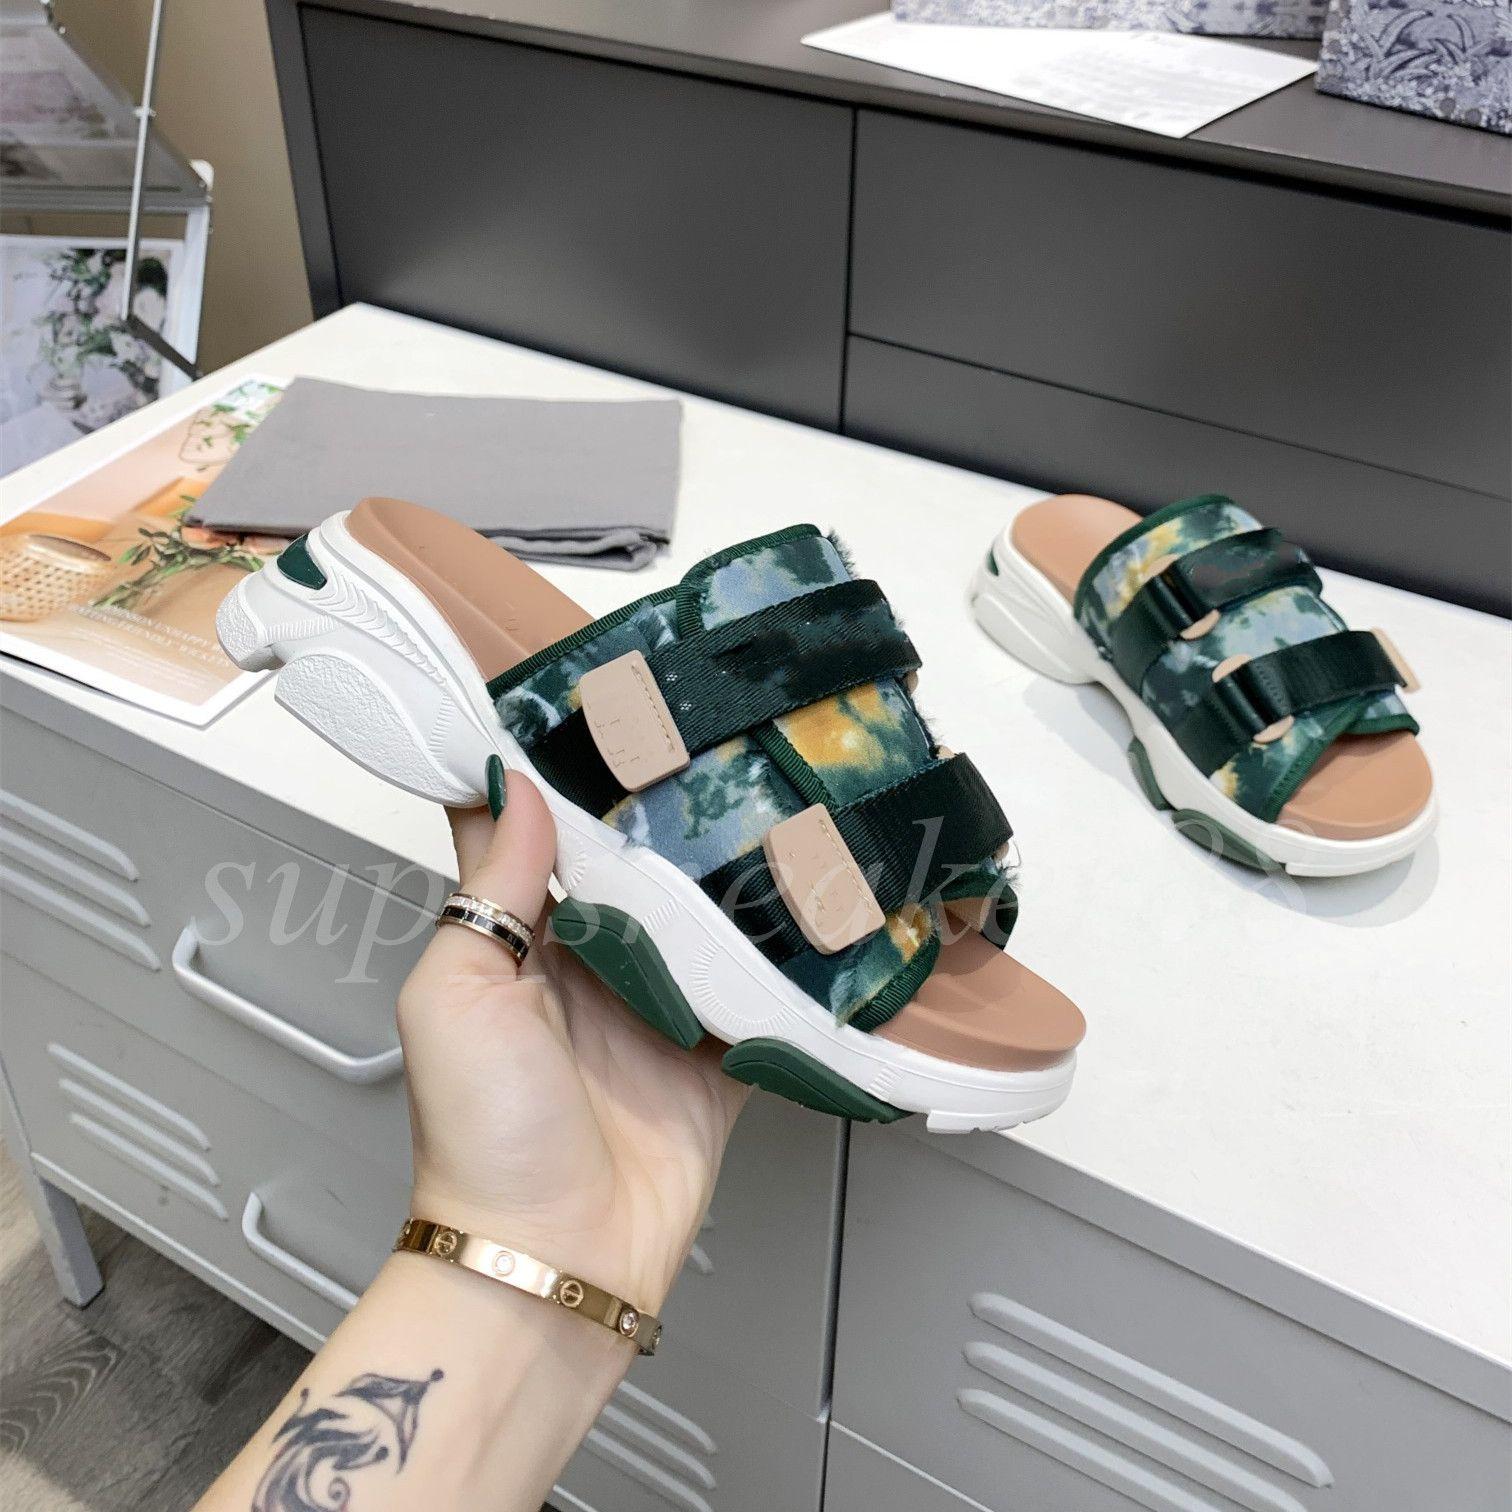 Sandalias Slippers Oro Patente Inlaid Para Mujer Tobillo Lace Up Mujeres Gruesa Parte Impermeable Falda de fiesta de tacón alto con caja de caja